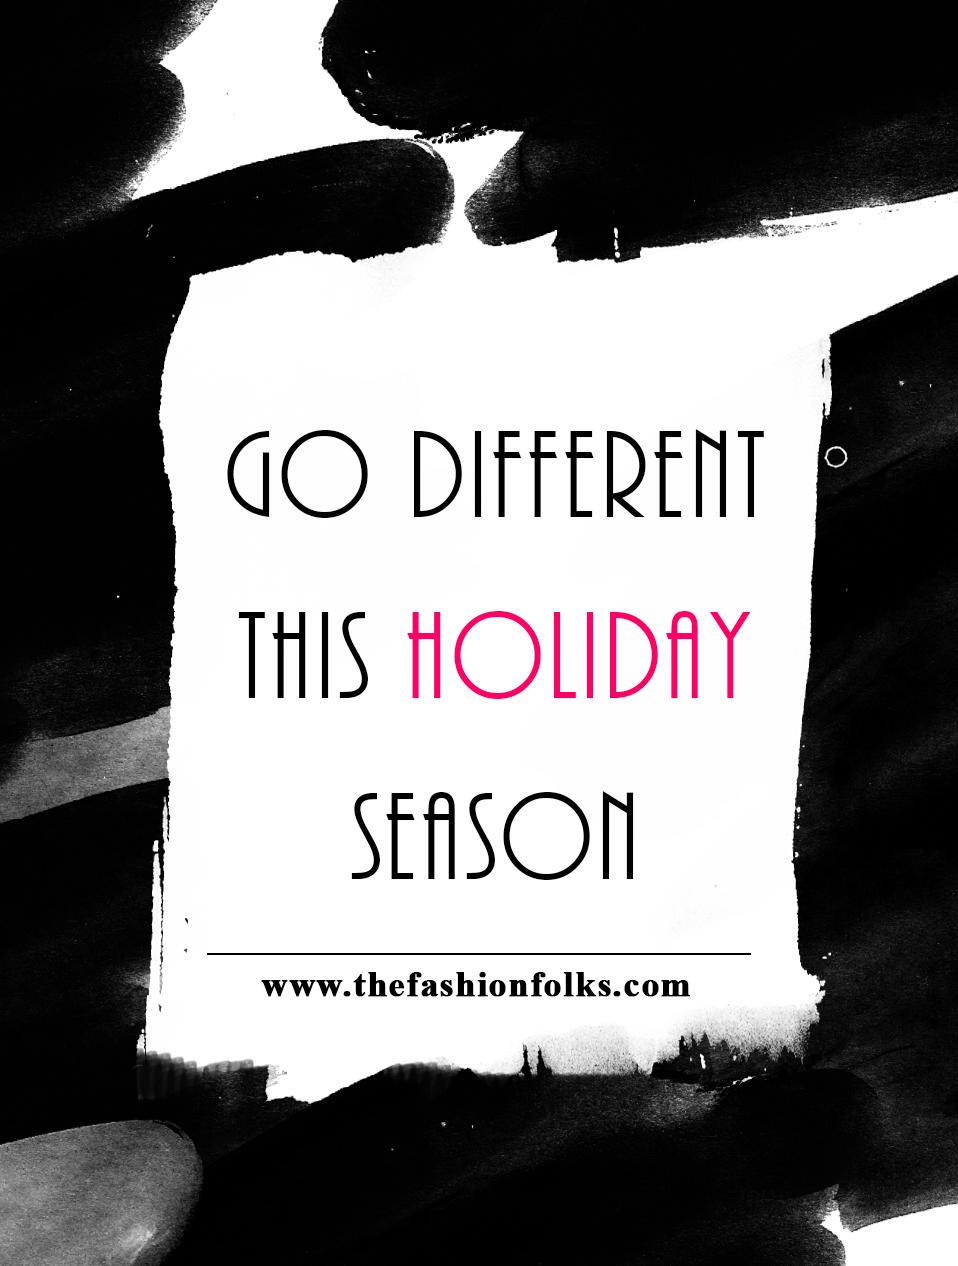 Go Different This Holiday Season   The Fashion Folks